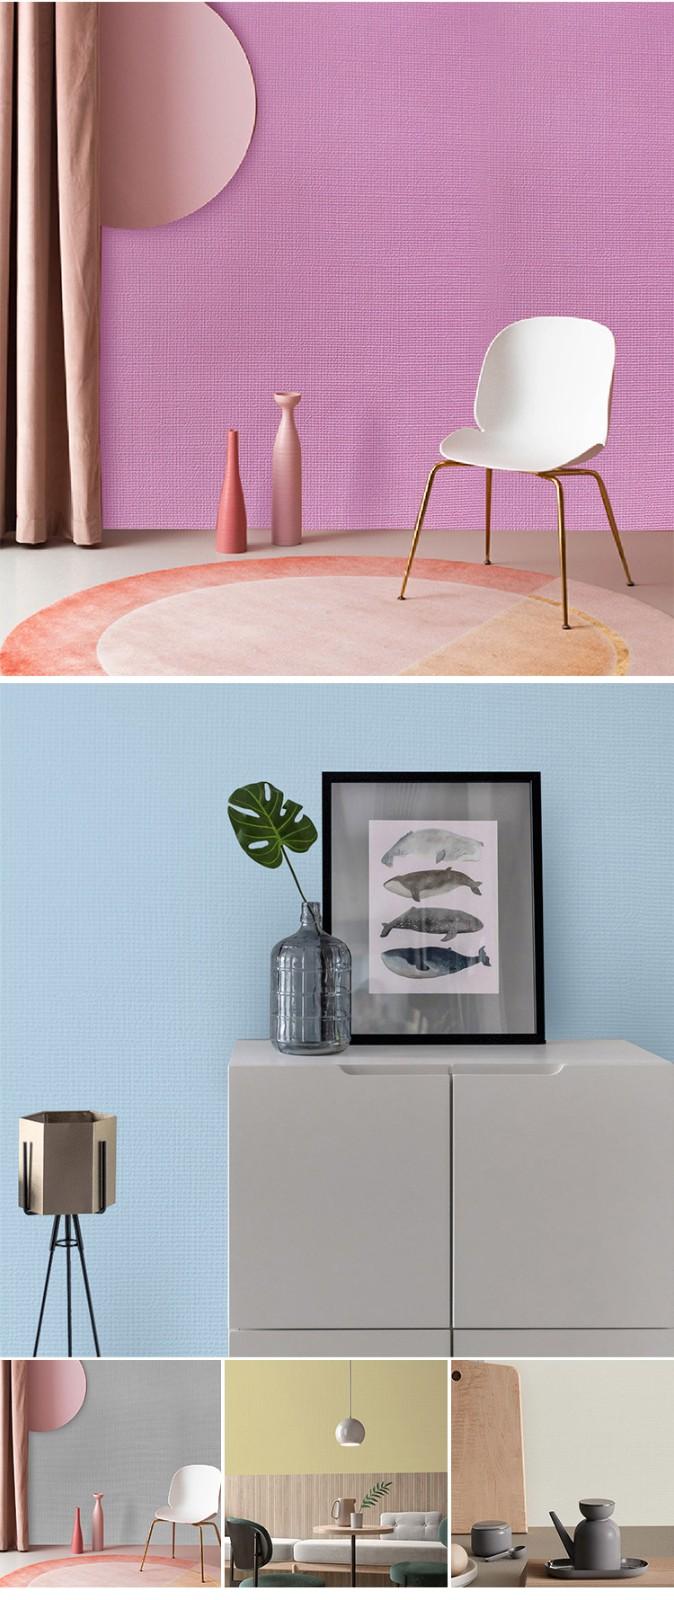 SUNYE factory price solid color removable wallpaper best manufacturer for sale-5